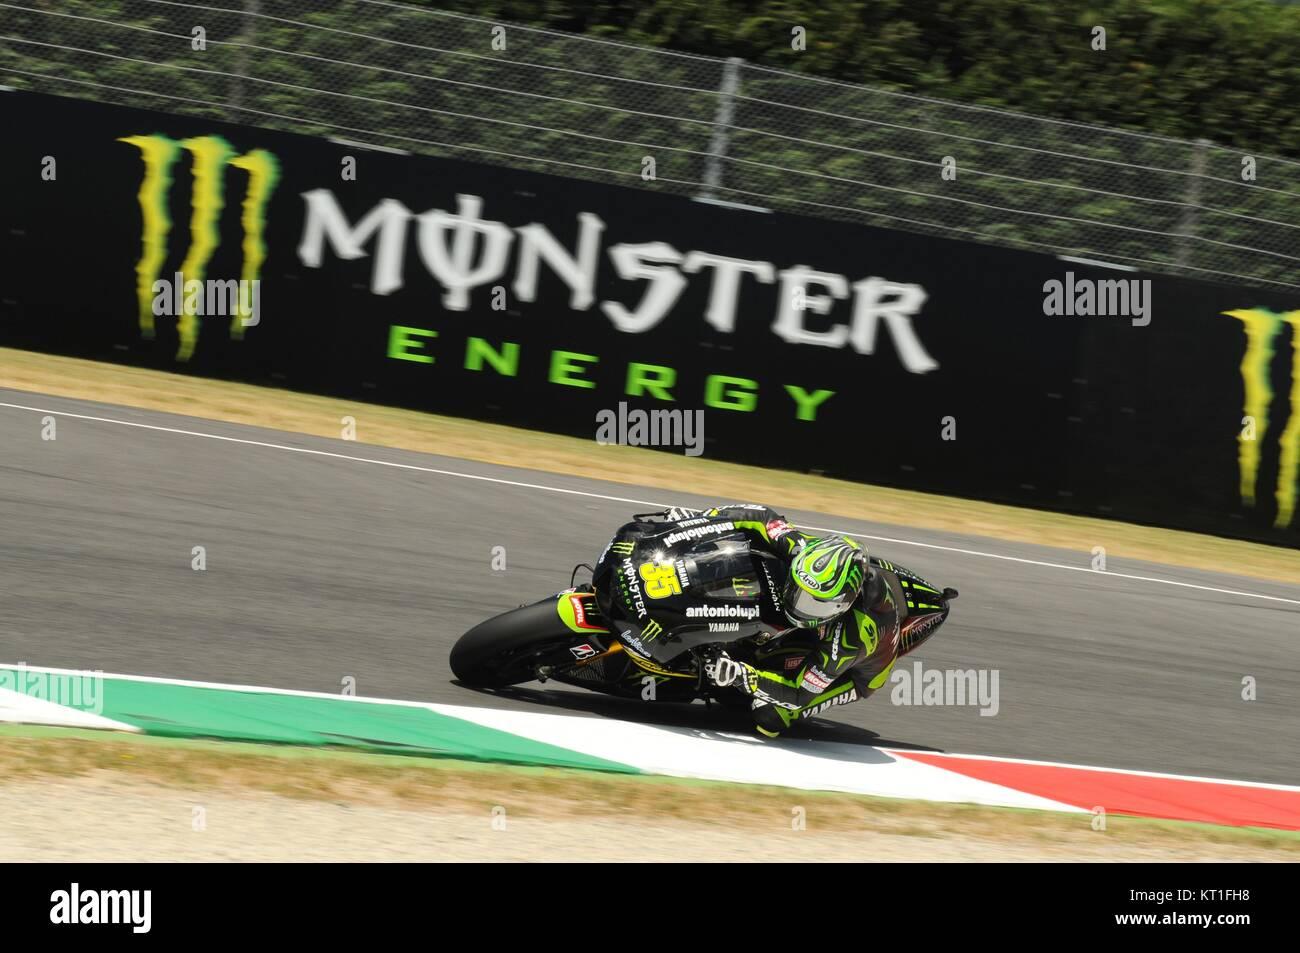 MUGELLO - ITALY, JULY 13, 2012: British Yamaha rider Cal Crutchlow during Qualify Session Grand Prix TIM of Italy - Stock Image